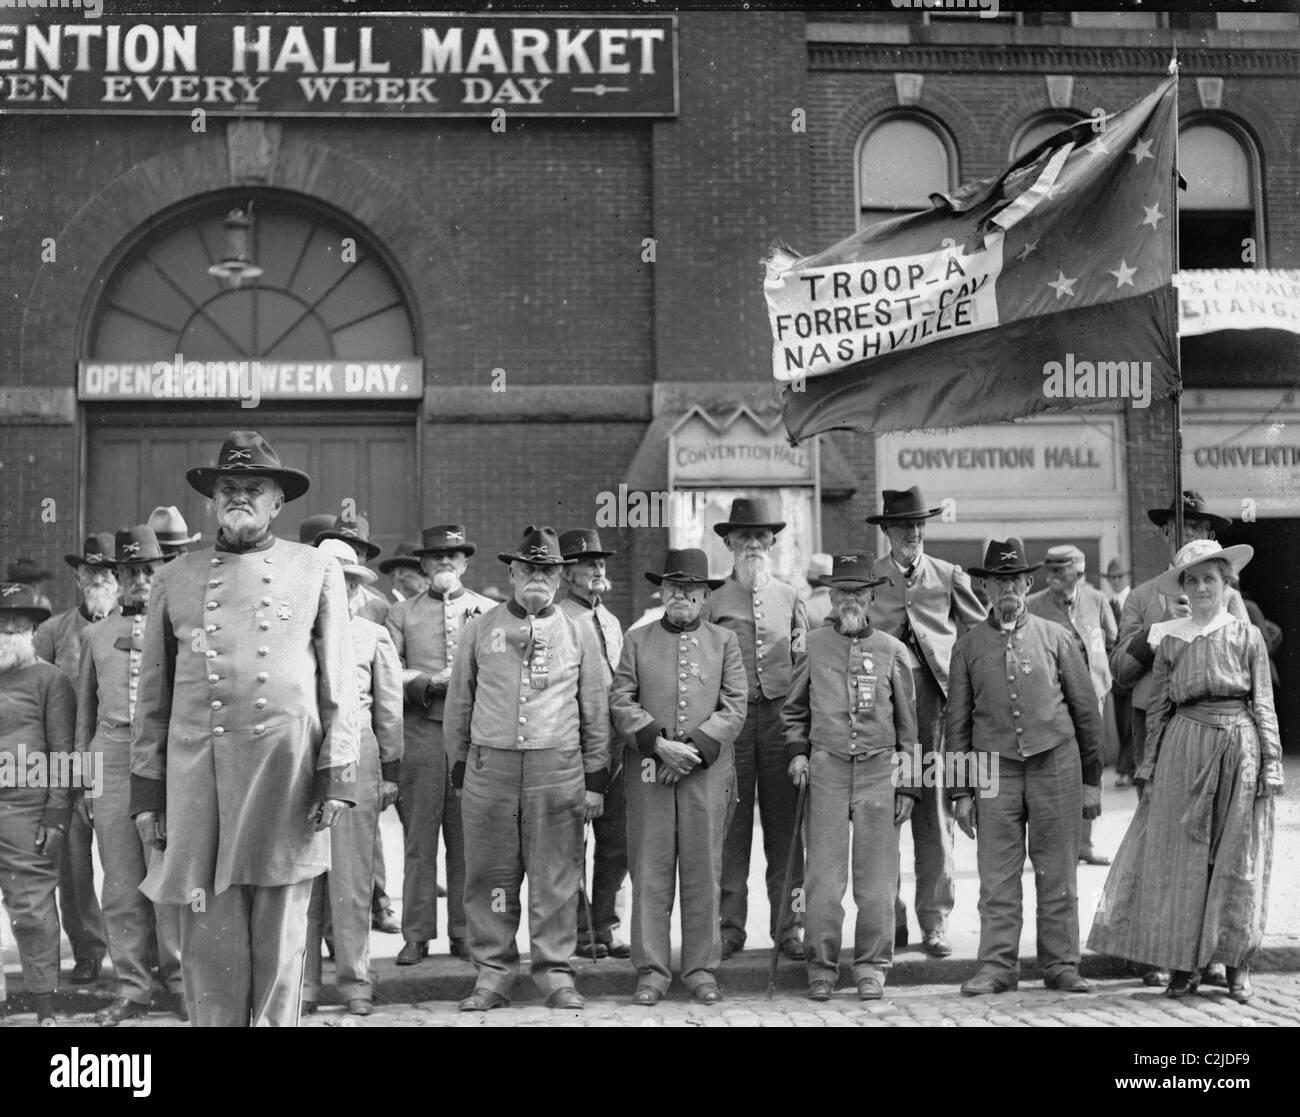 Confederate Veterans Reunion; old men in un Uniforms front of Nashville Convention Hall Market - Stock Image